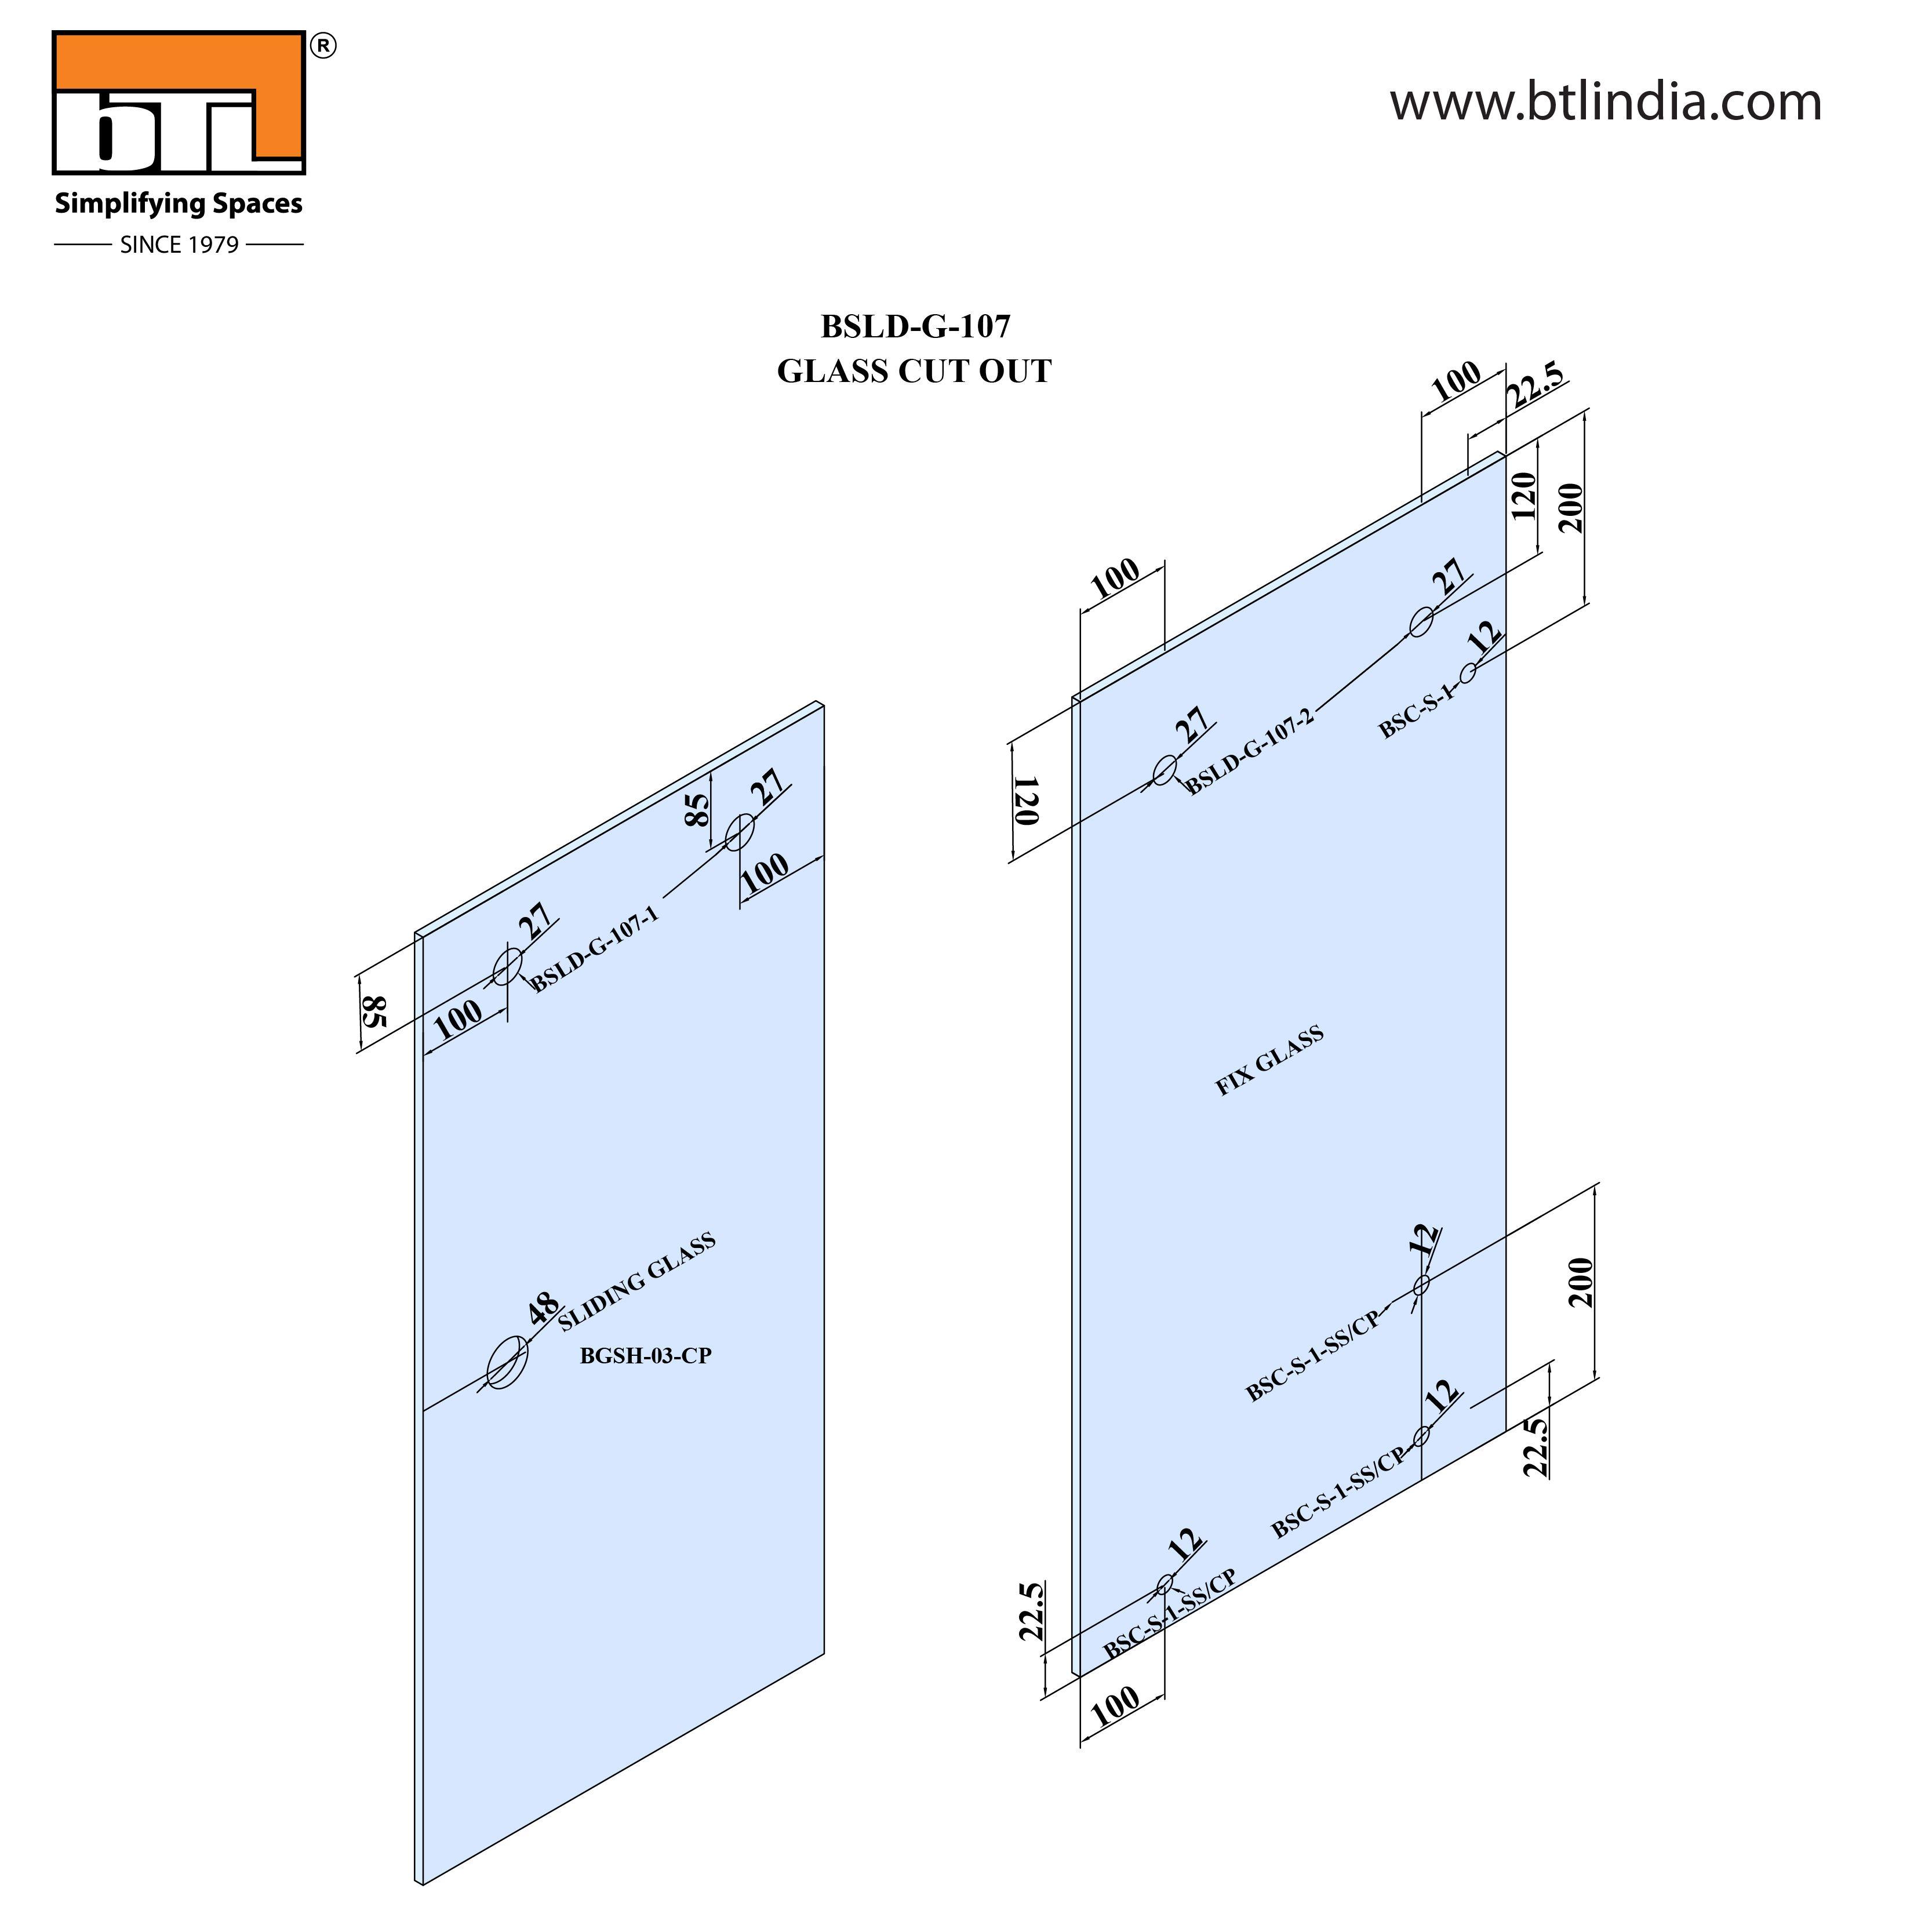 BTL Glass Door Sliding Set - G107 - Installation Instruction with Glass Door Cut out